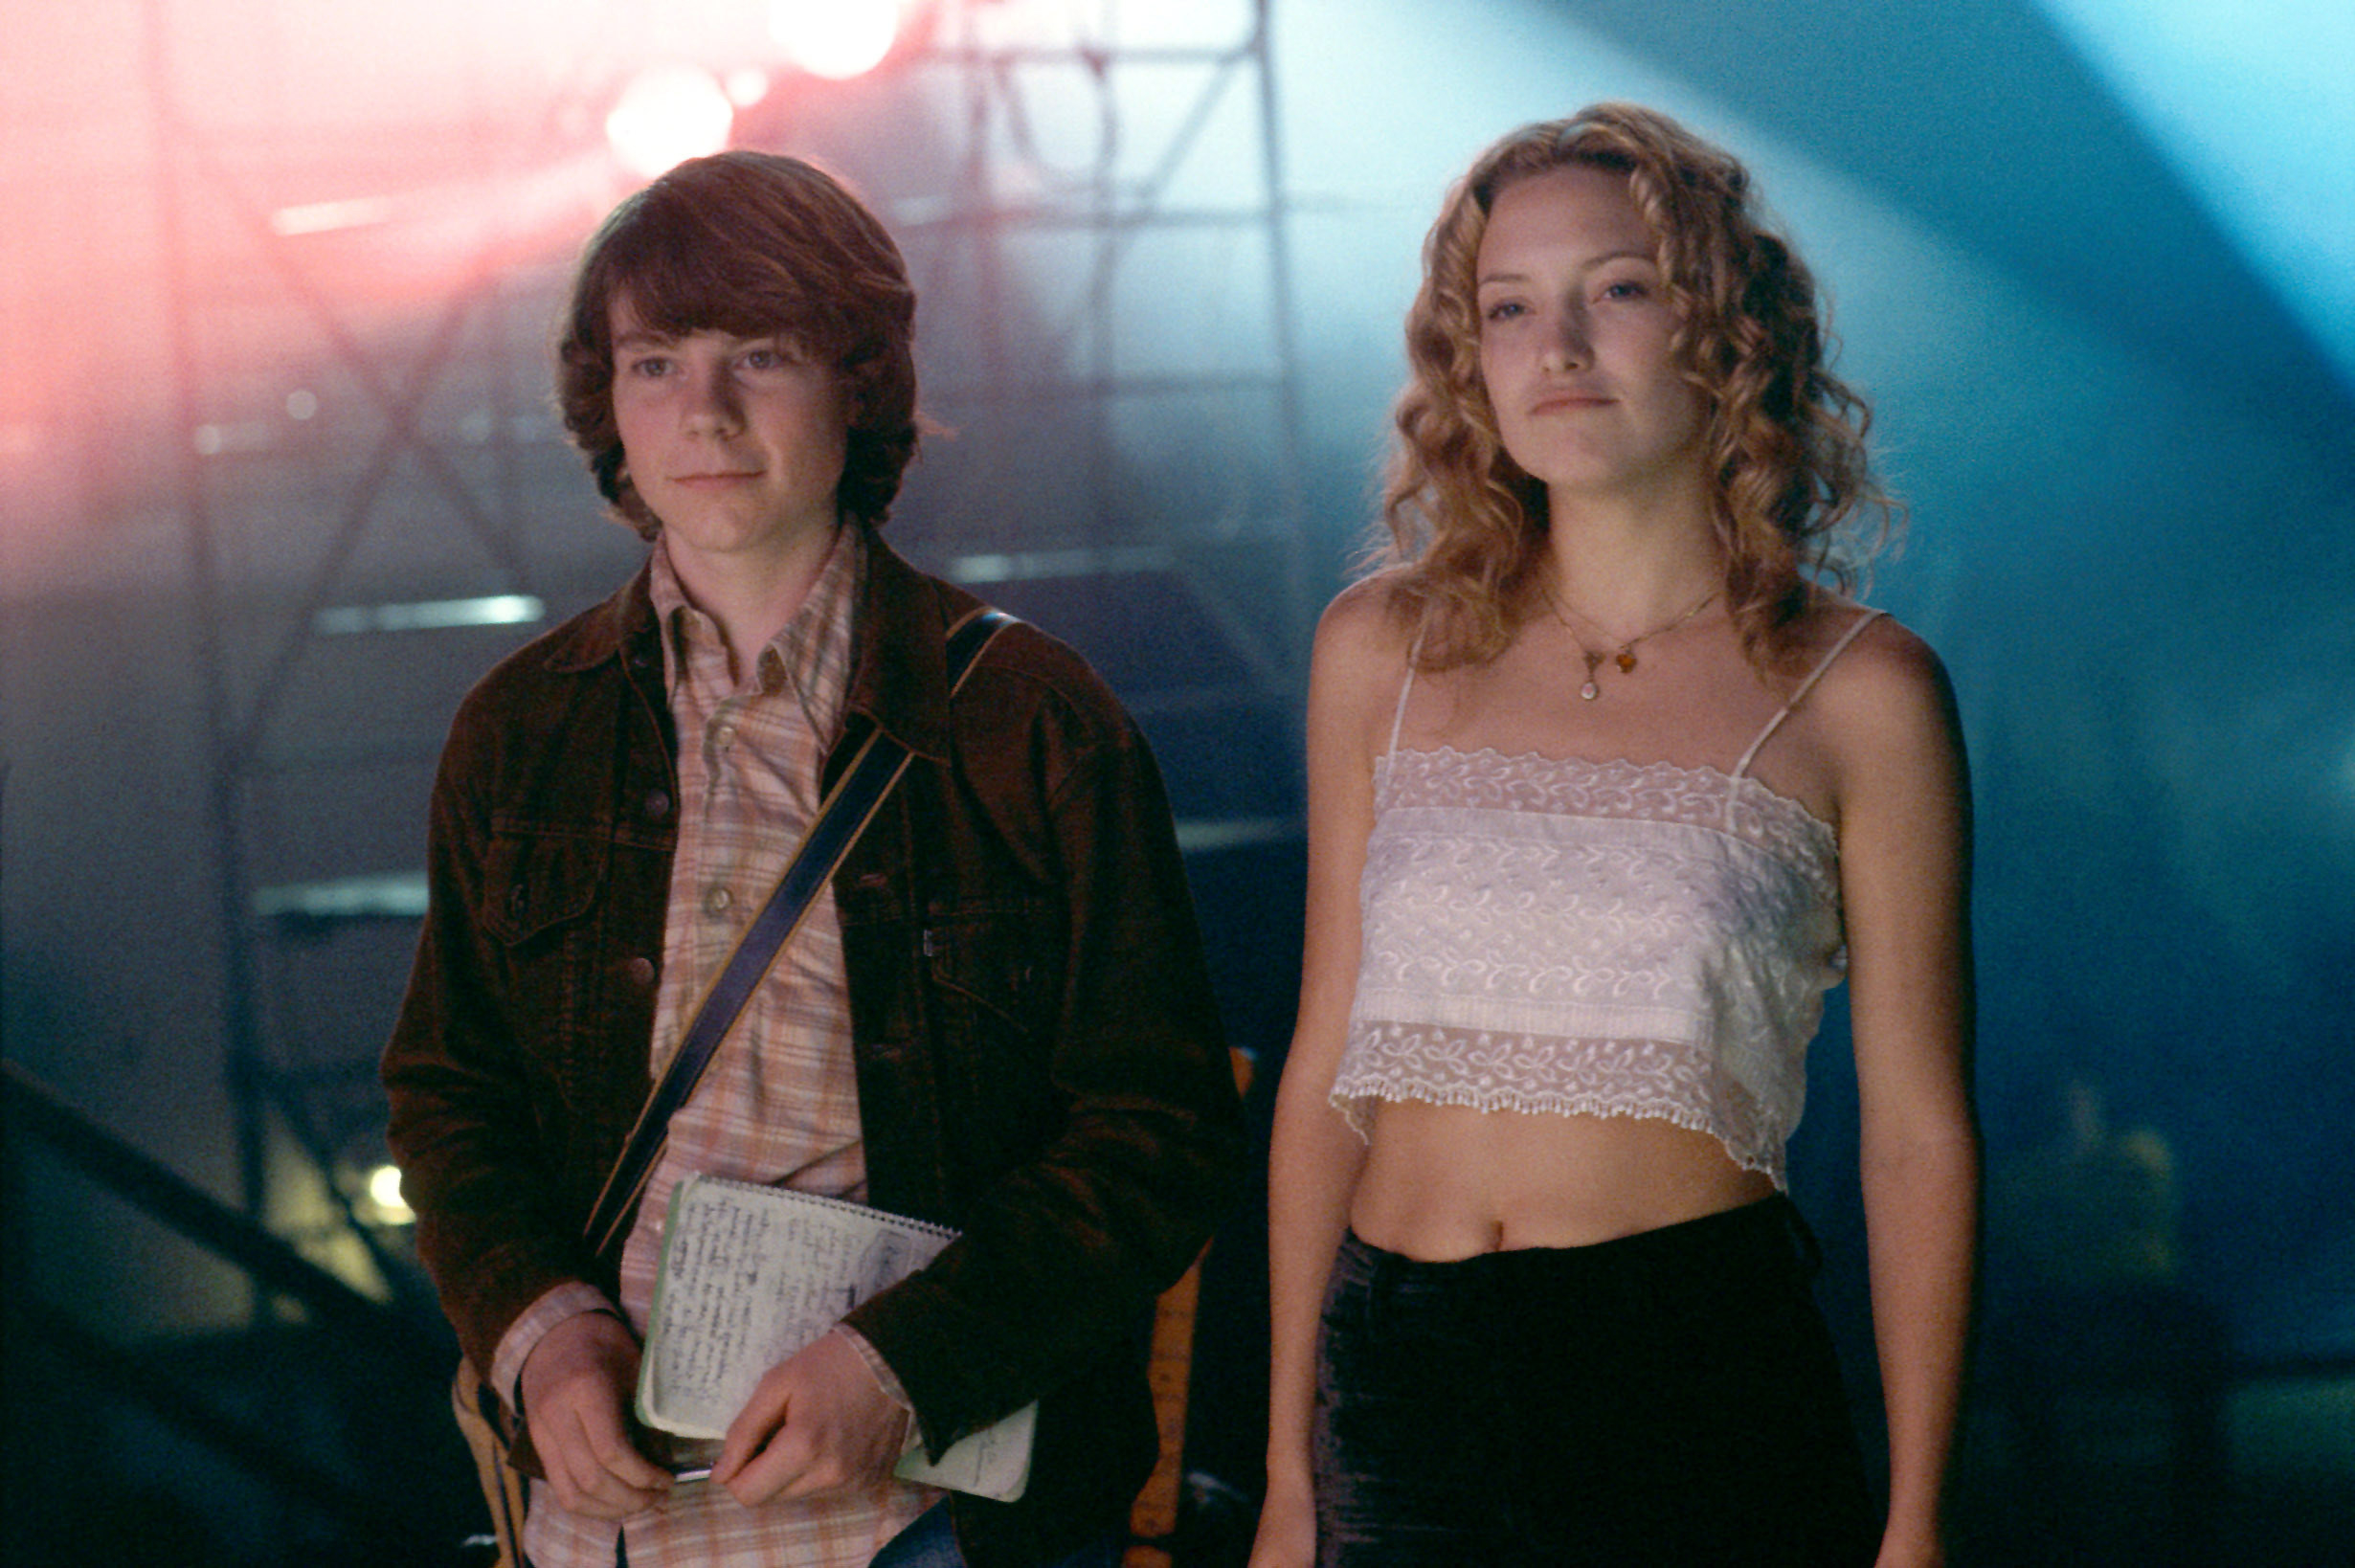 Patrick Fugit and Kate Hudson stand backstage a concert